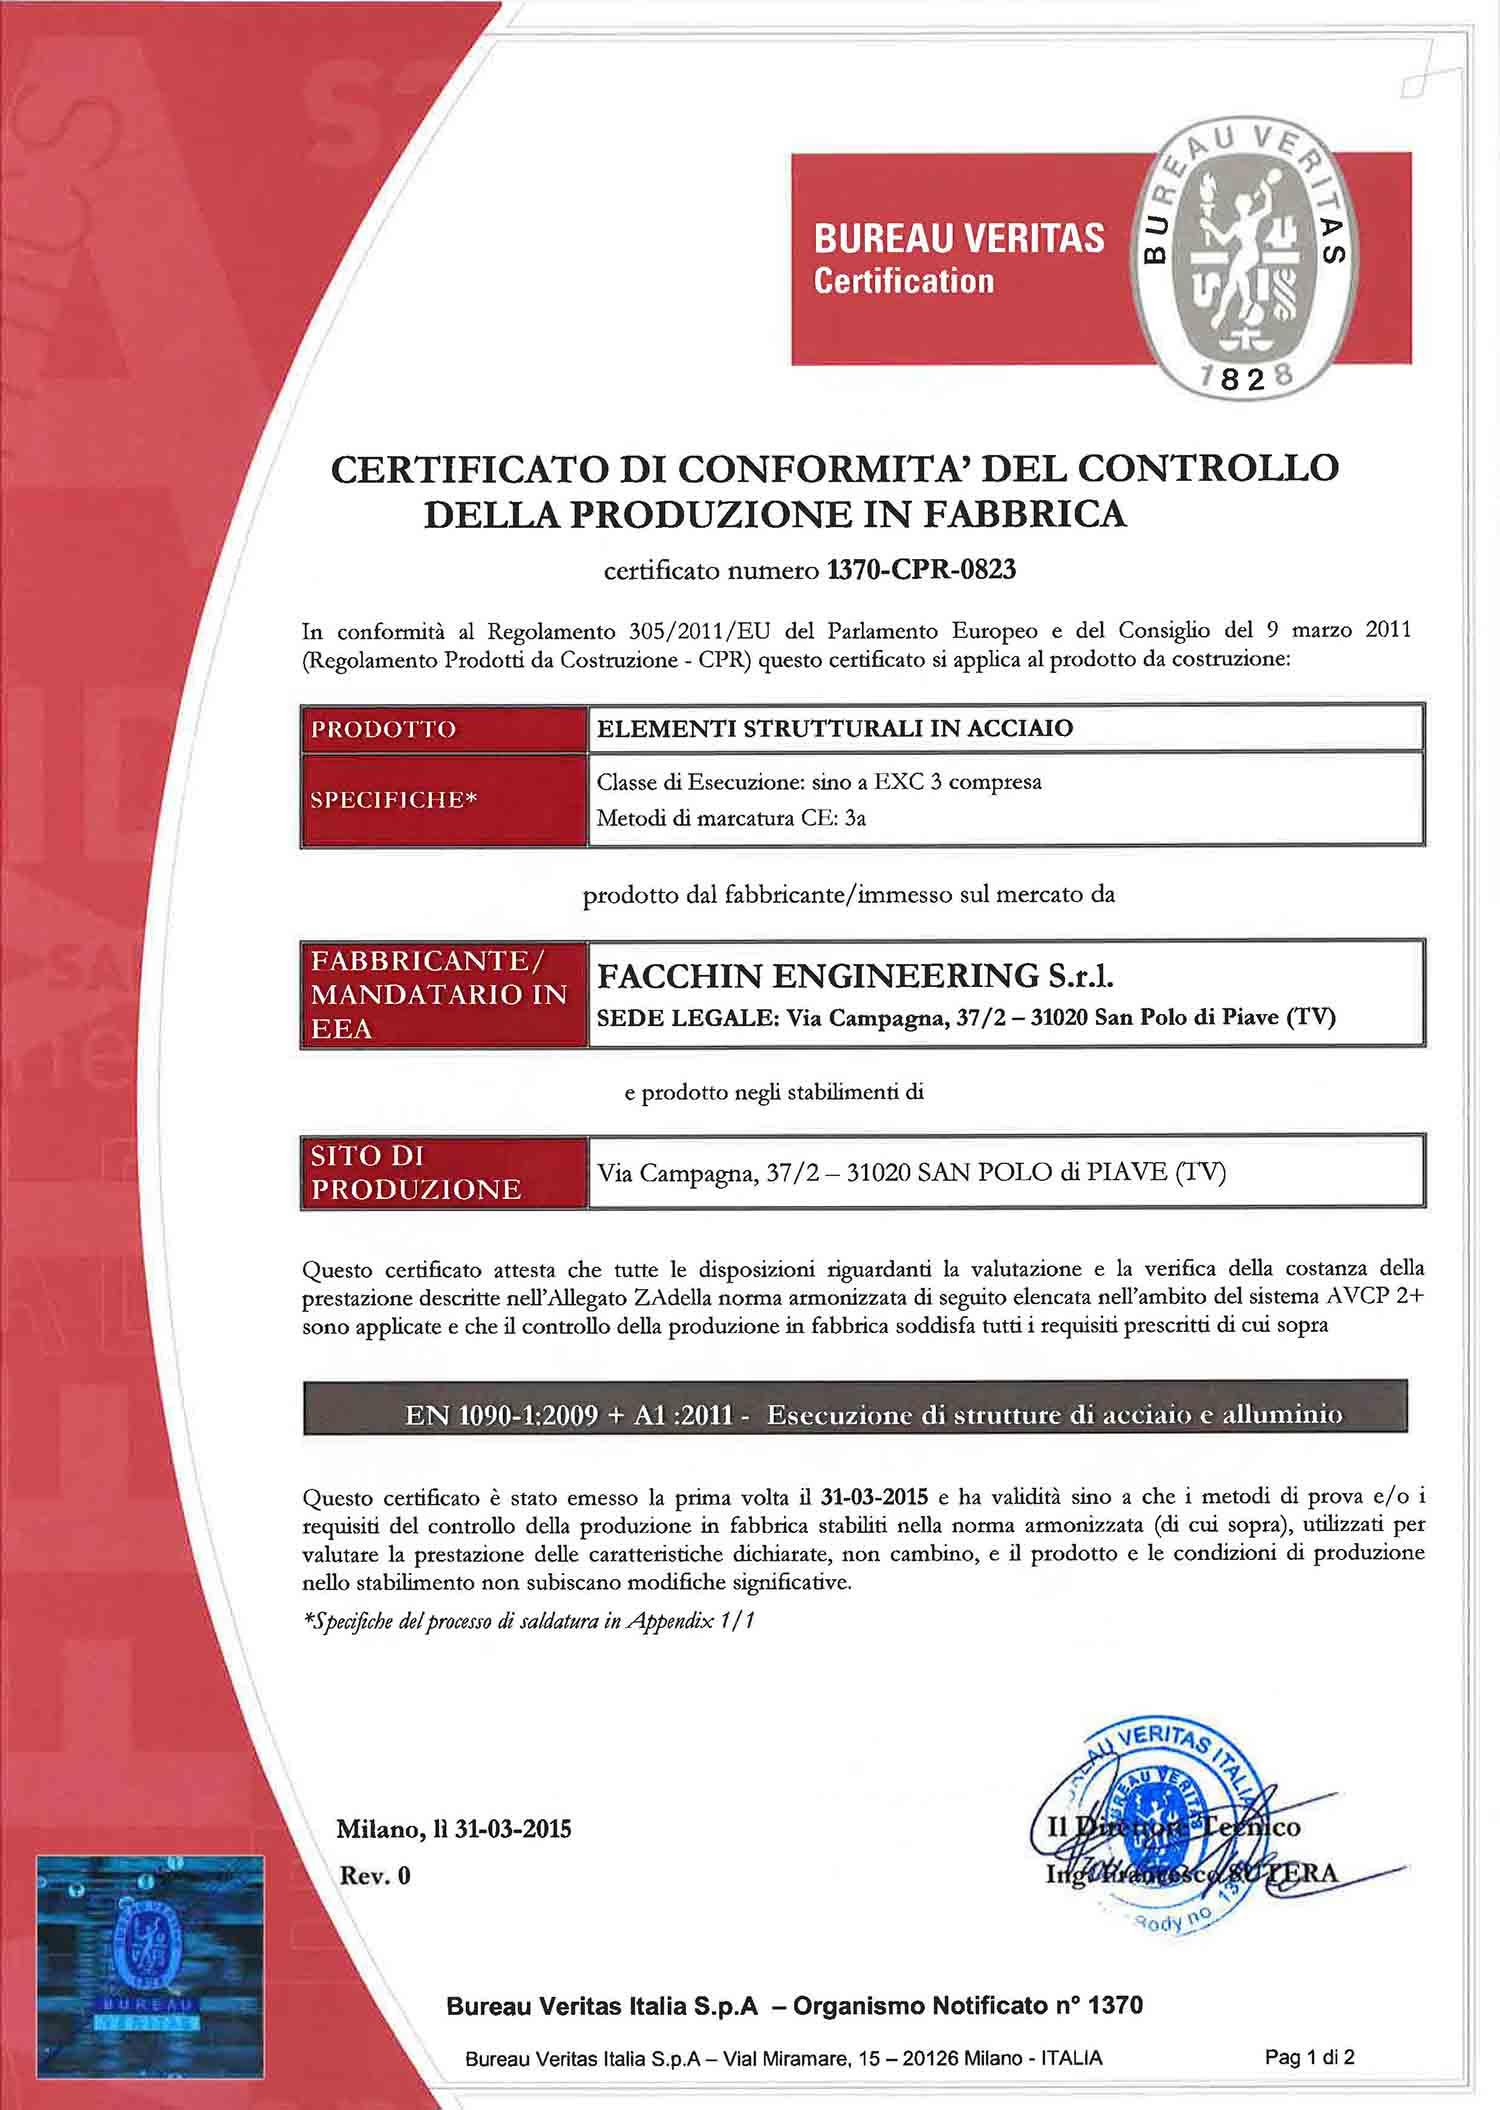 certificato-facchin-engineering-srl-1090_pagina_1